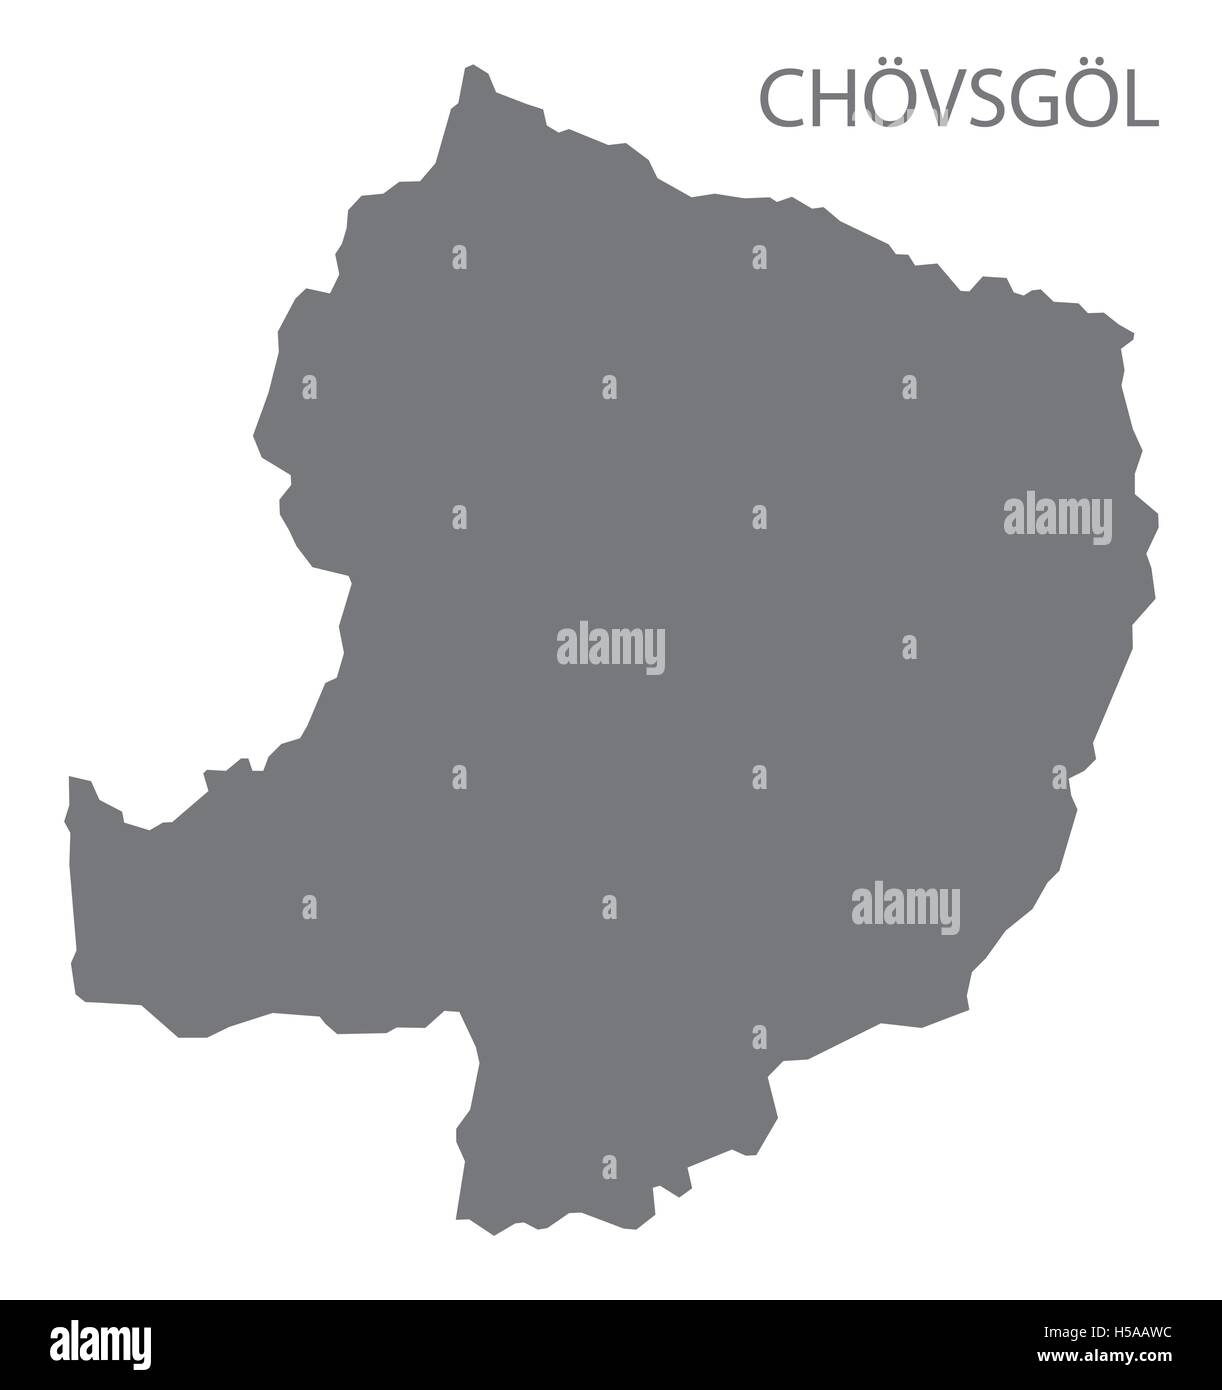 Chovsgol Mongolia Map grey - Stock Vector